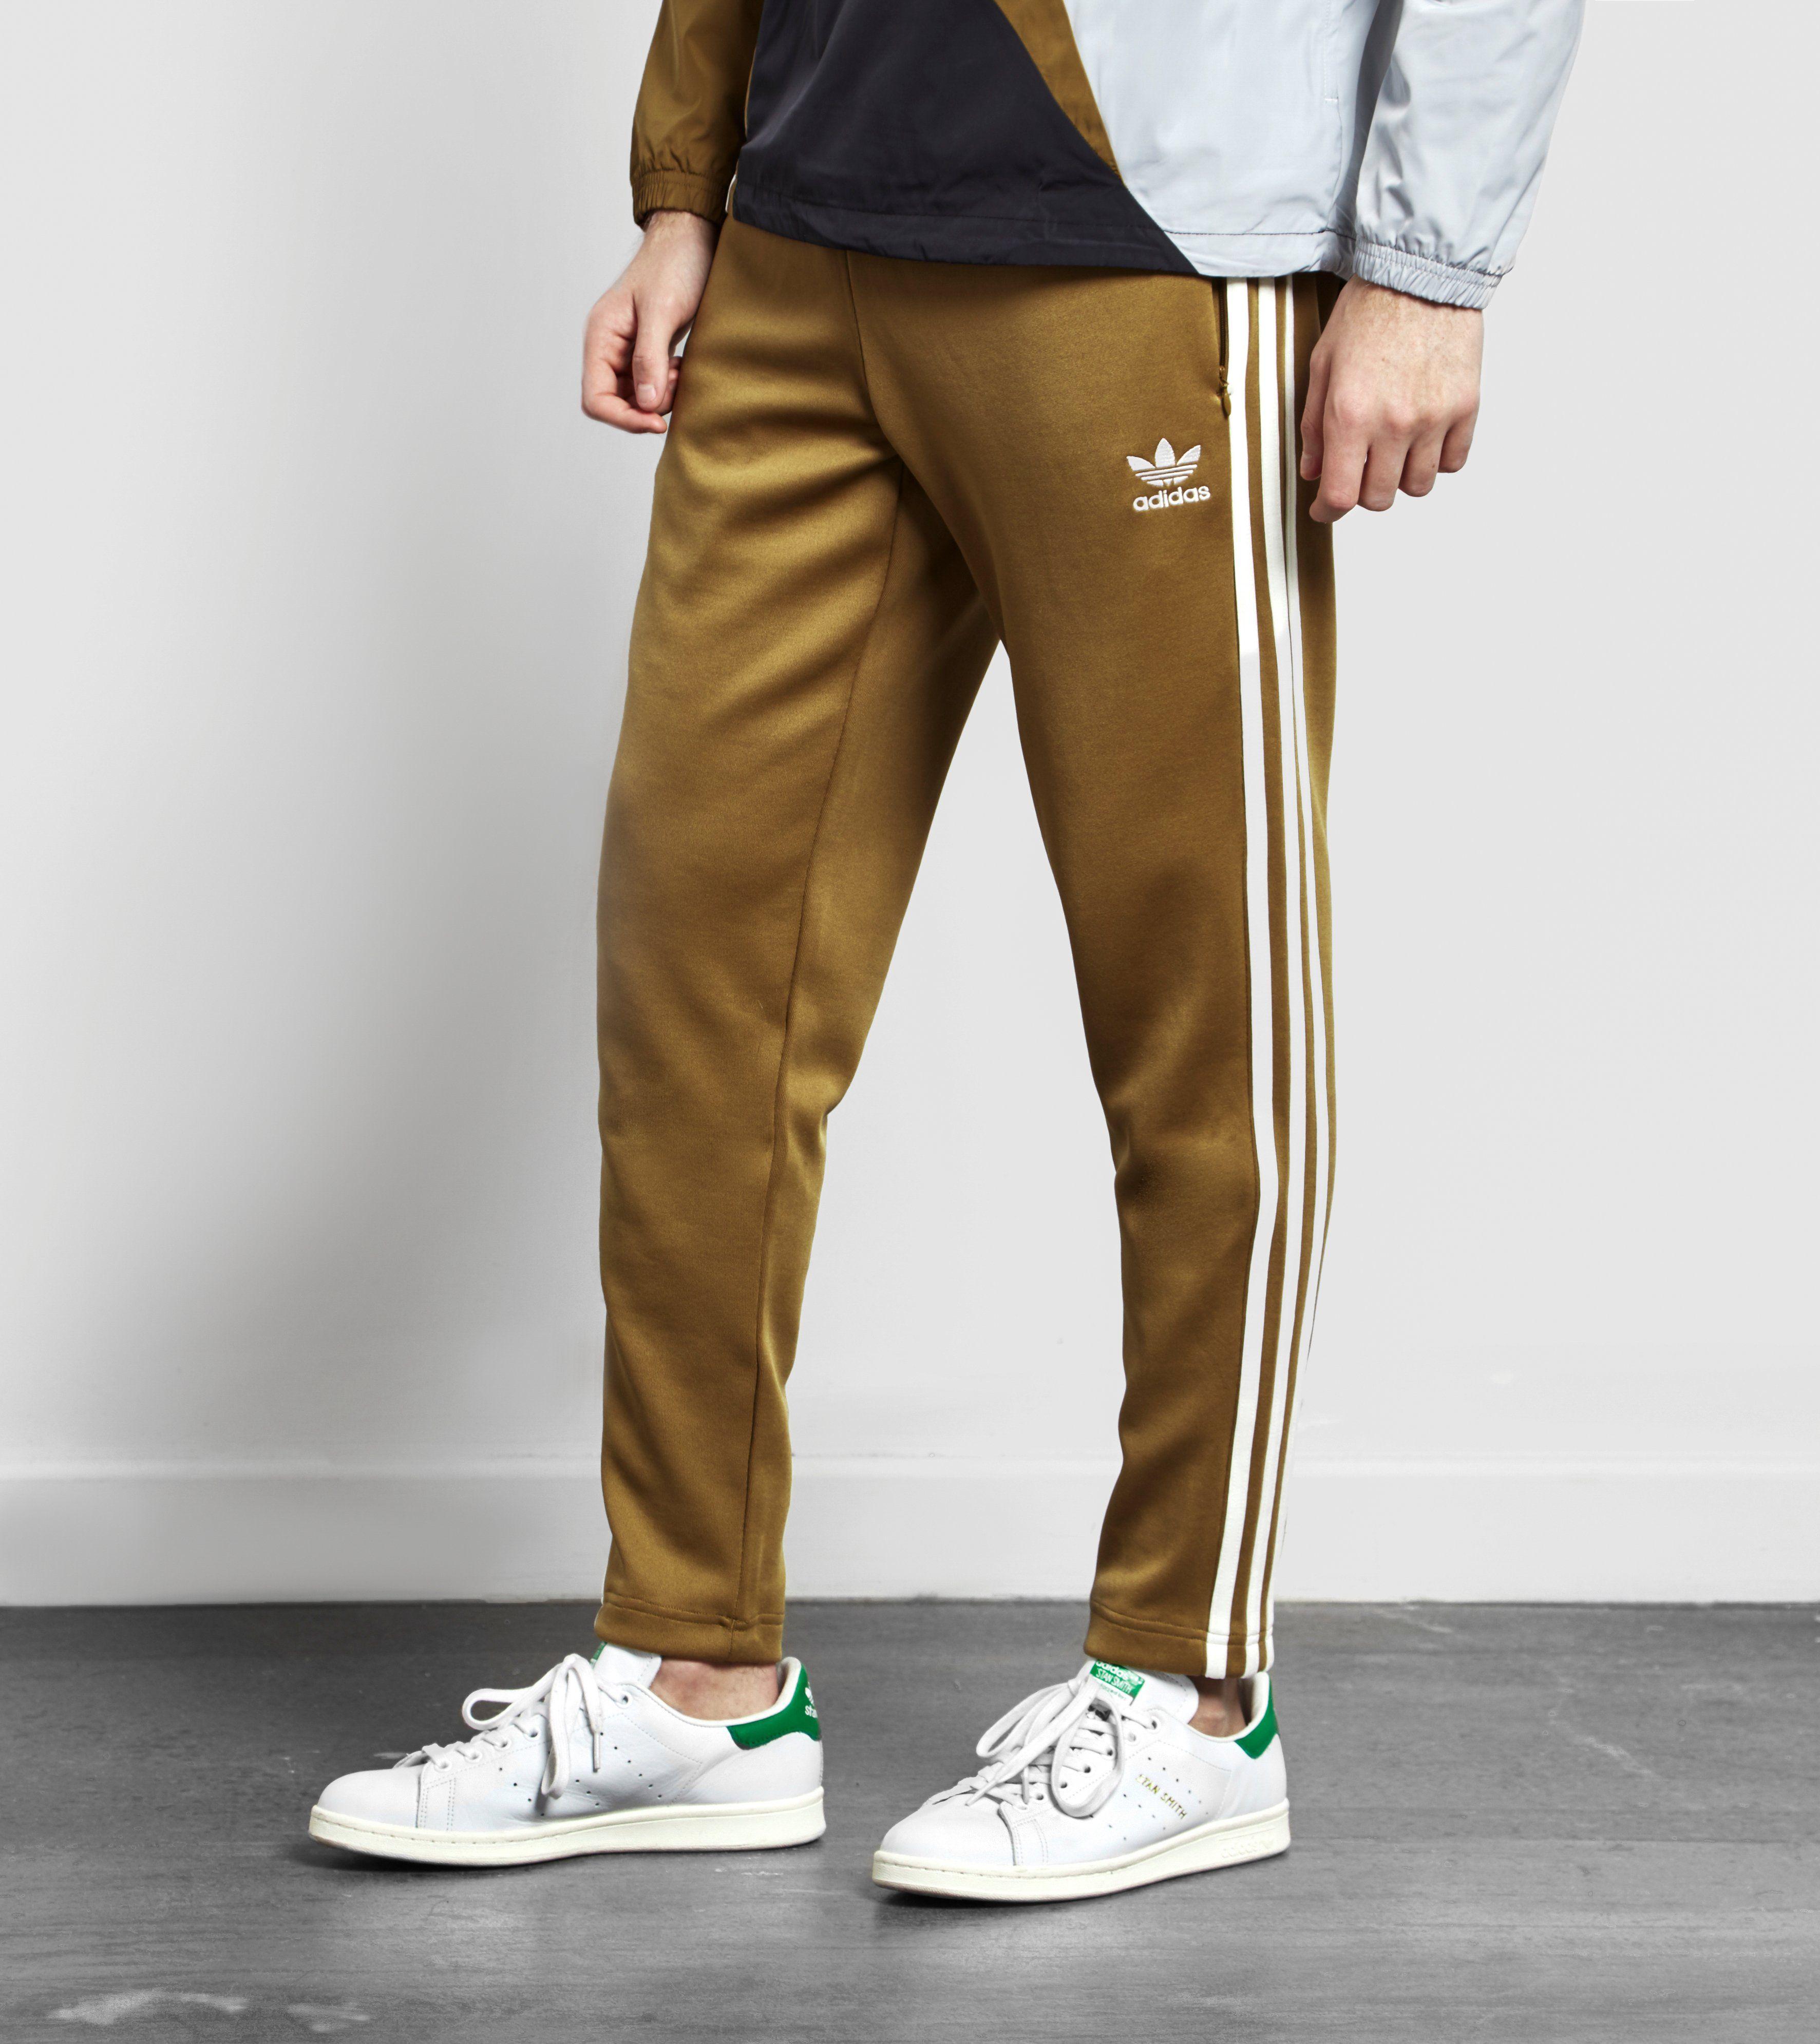 Adidas Originals Superstar Track Pant Size Exclusive